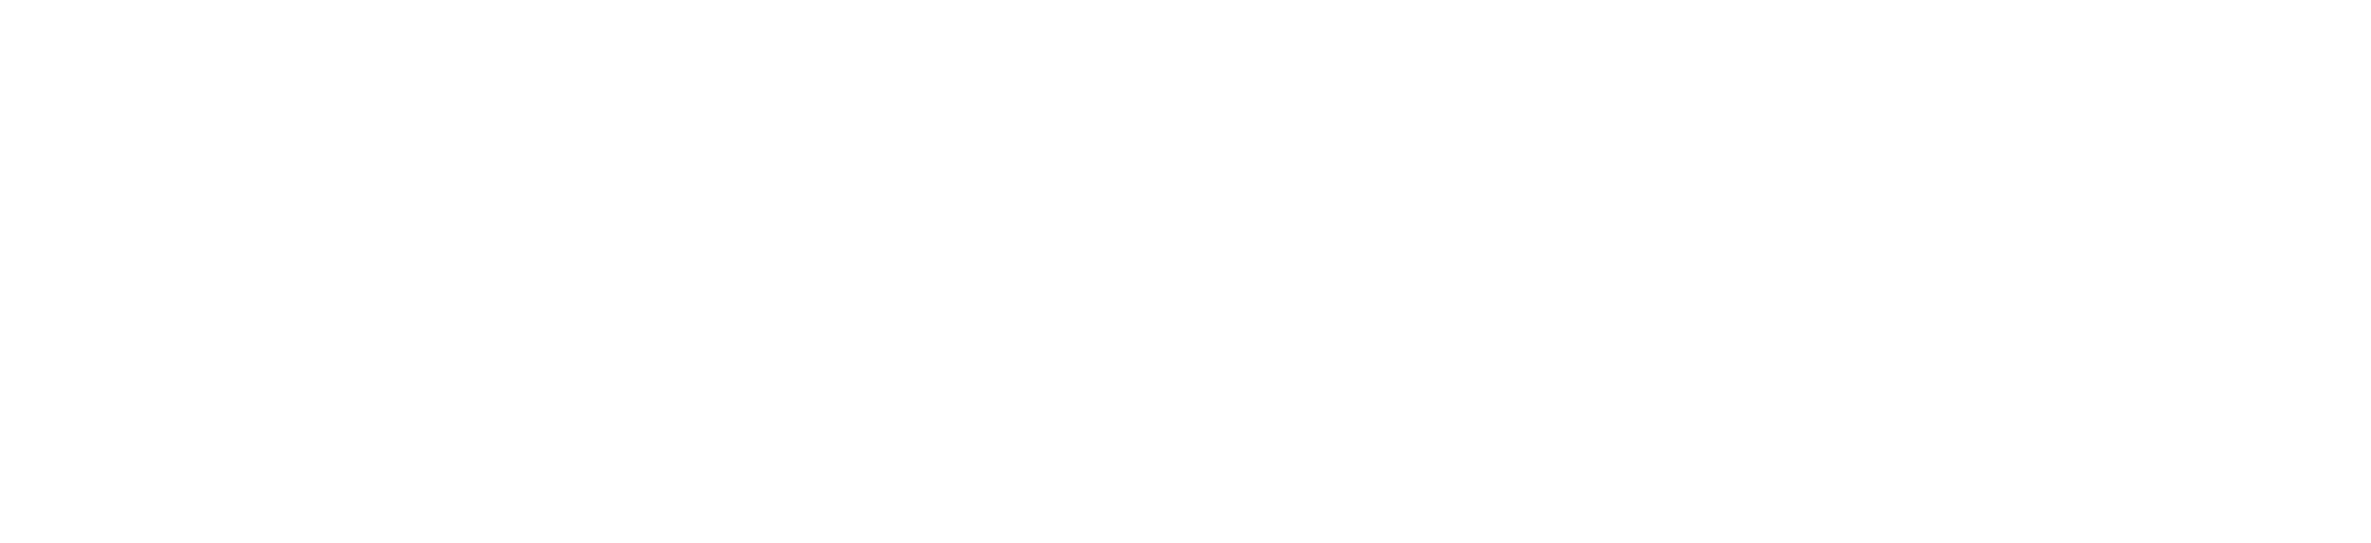 socialvalue-logo-white.png